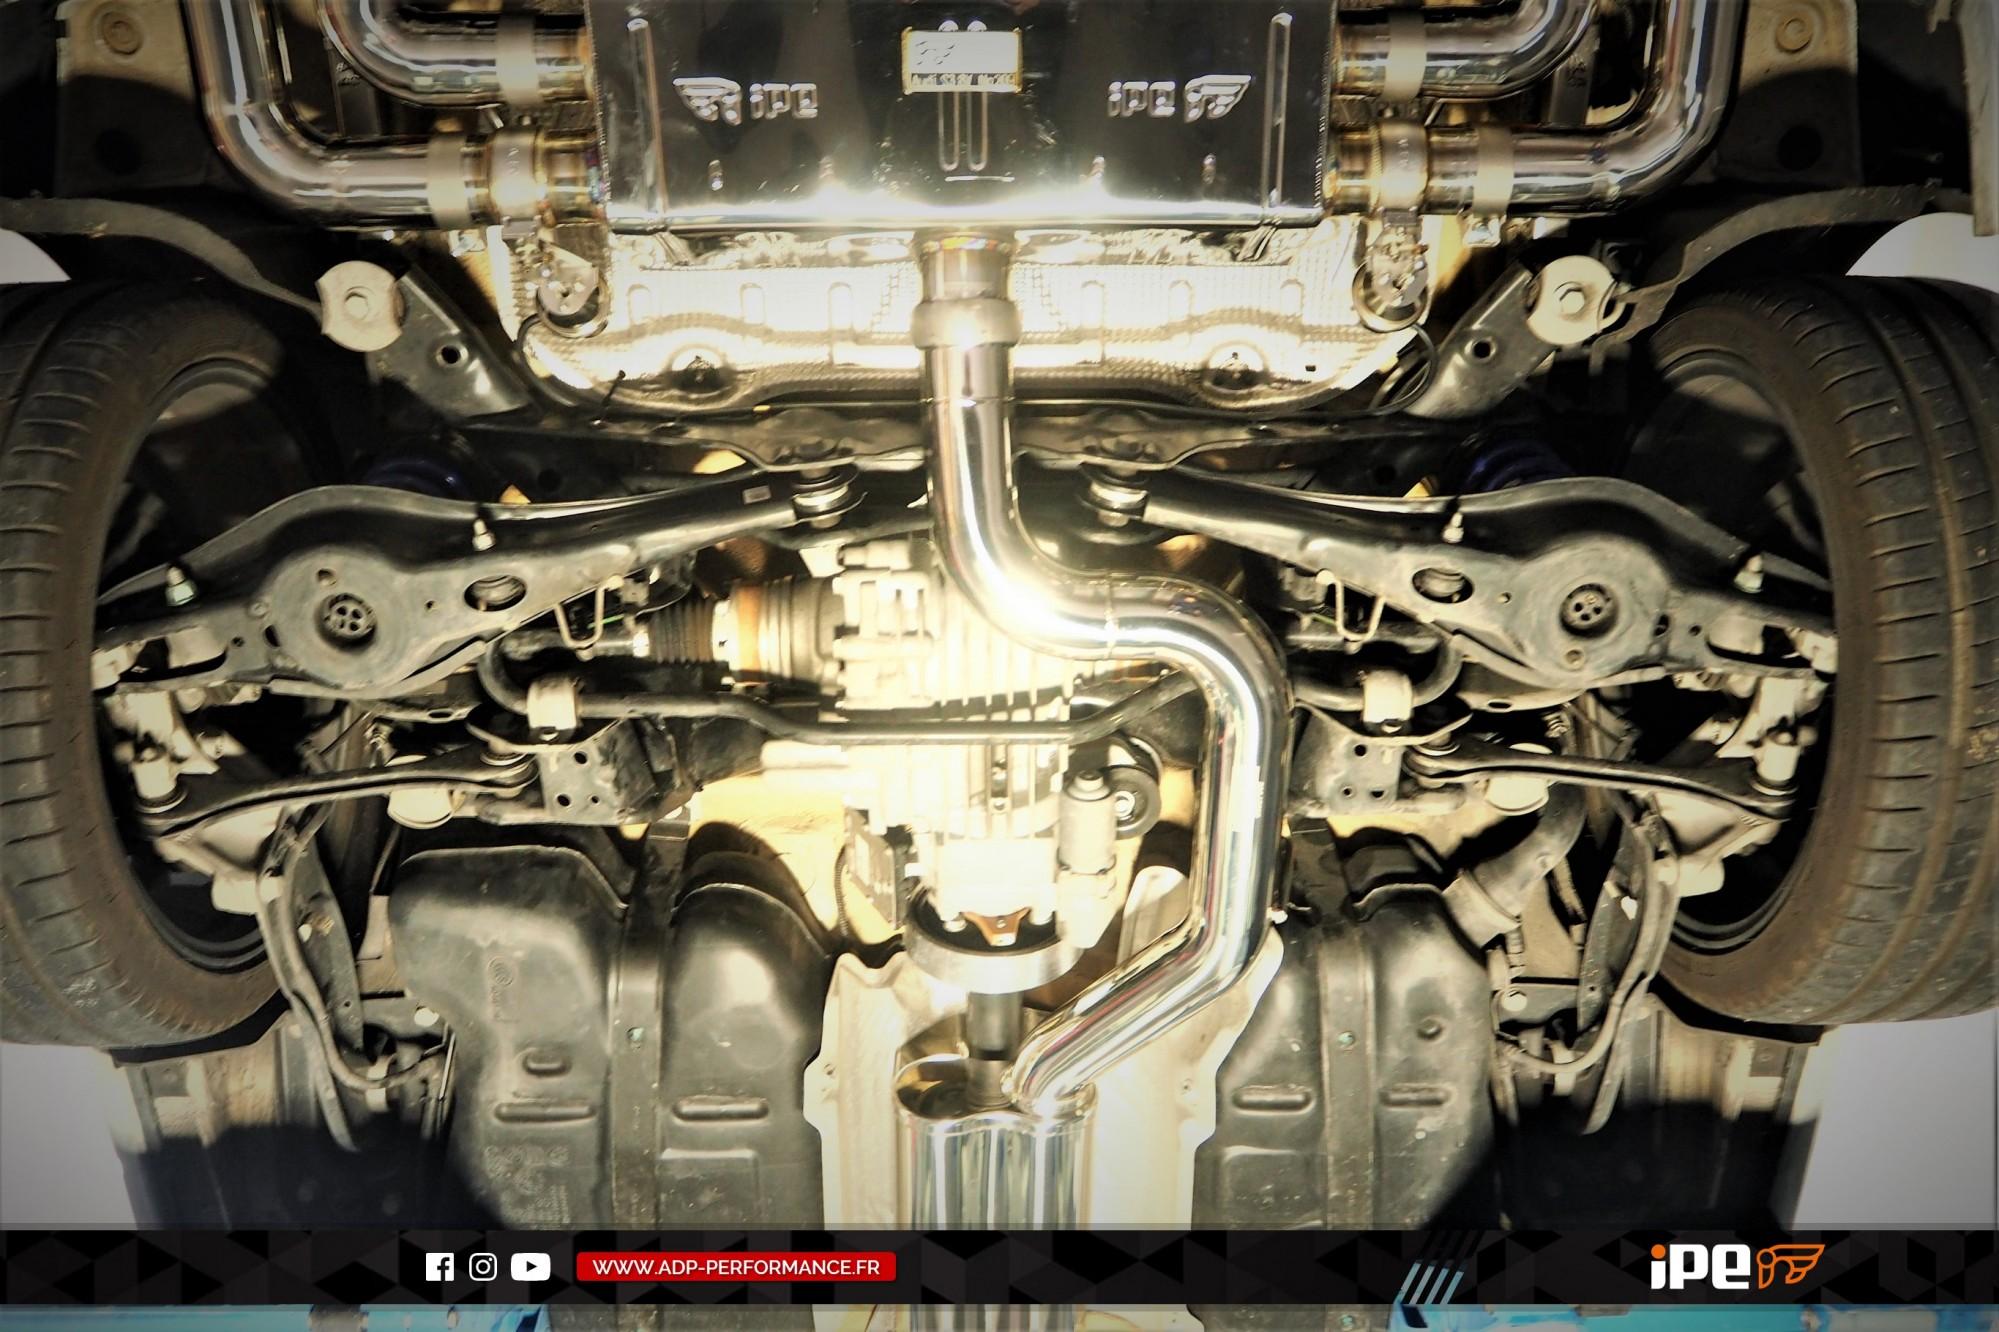 Ligne d'échappement (cat-back) iPE Innotech Vitrolles - Audi S3 8V - ADP Performance